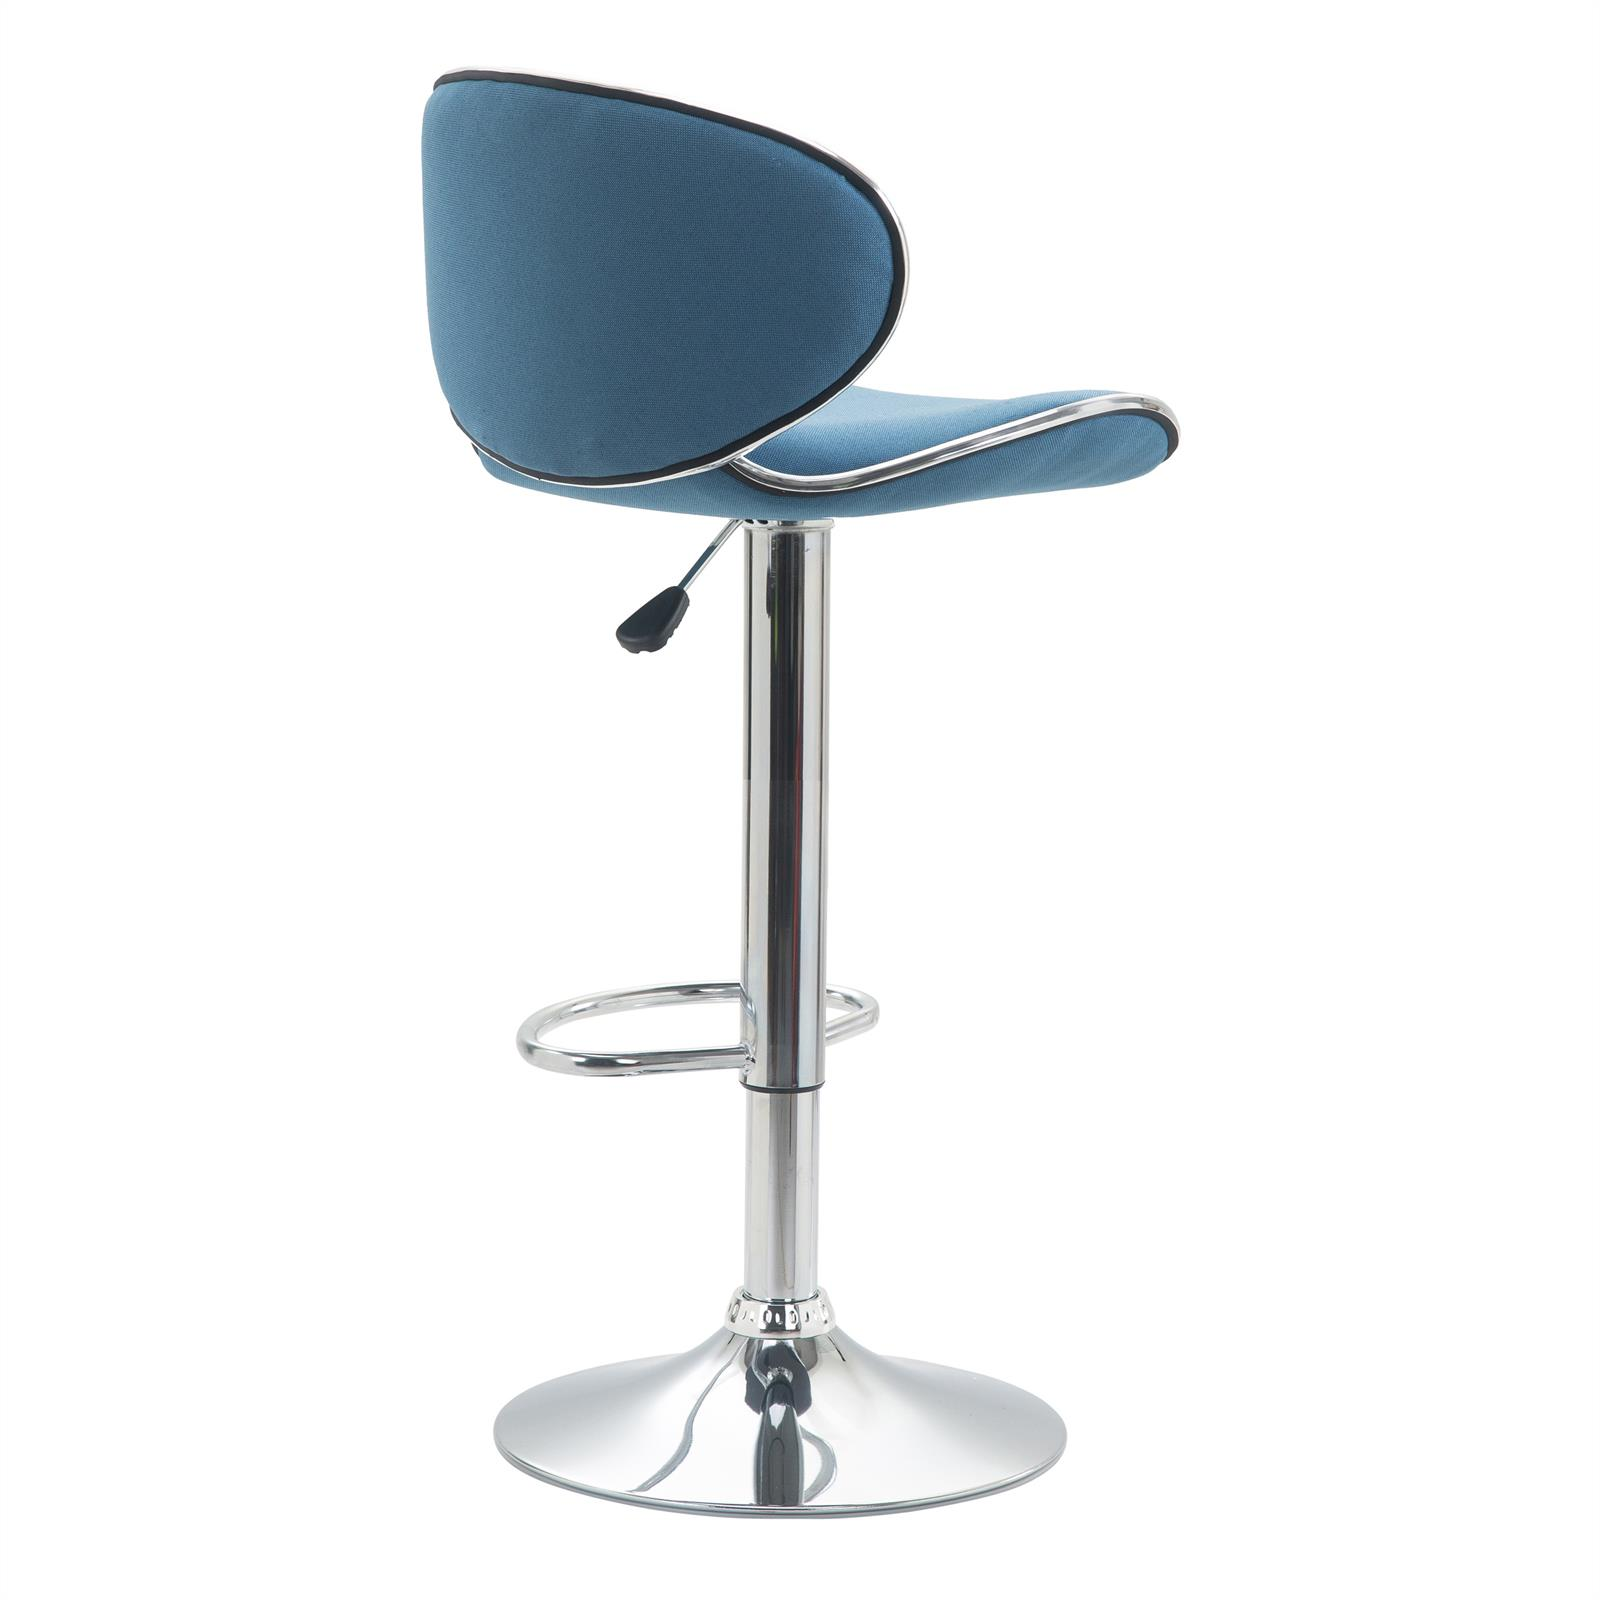 Barhocker lounge mit stoffbezug blau im 2er pack mobilia24 for Barhocker lounge